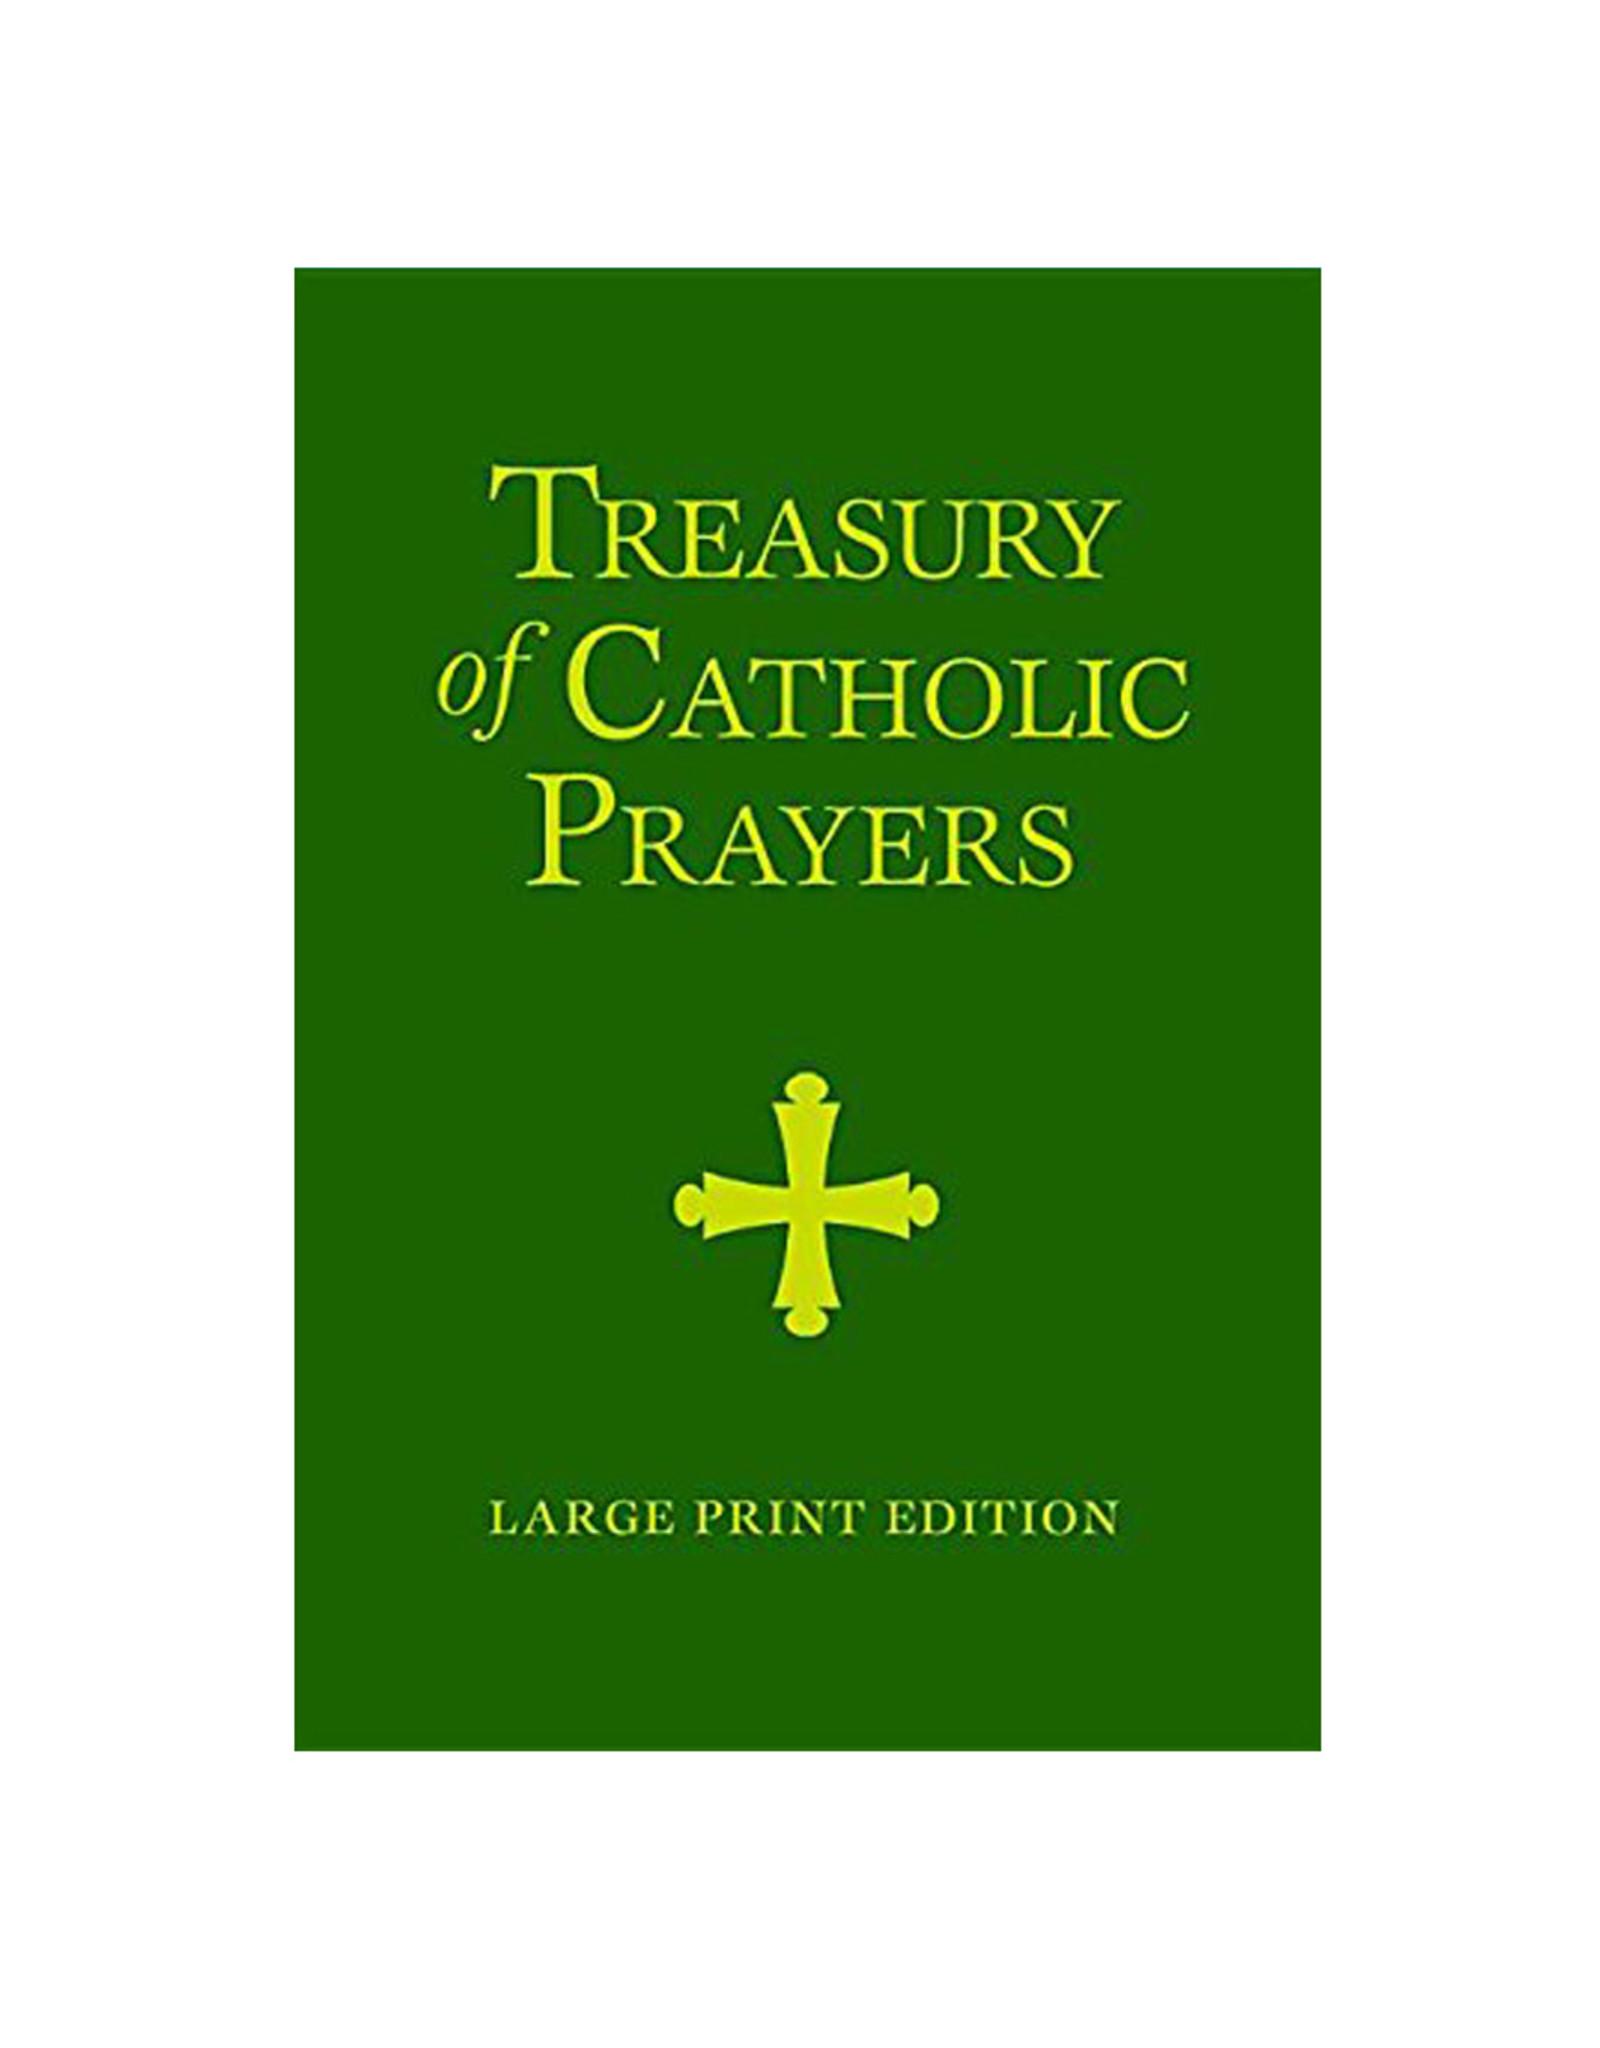 Treasury of catholic prayers (large print edition)